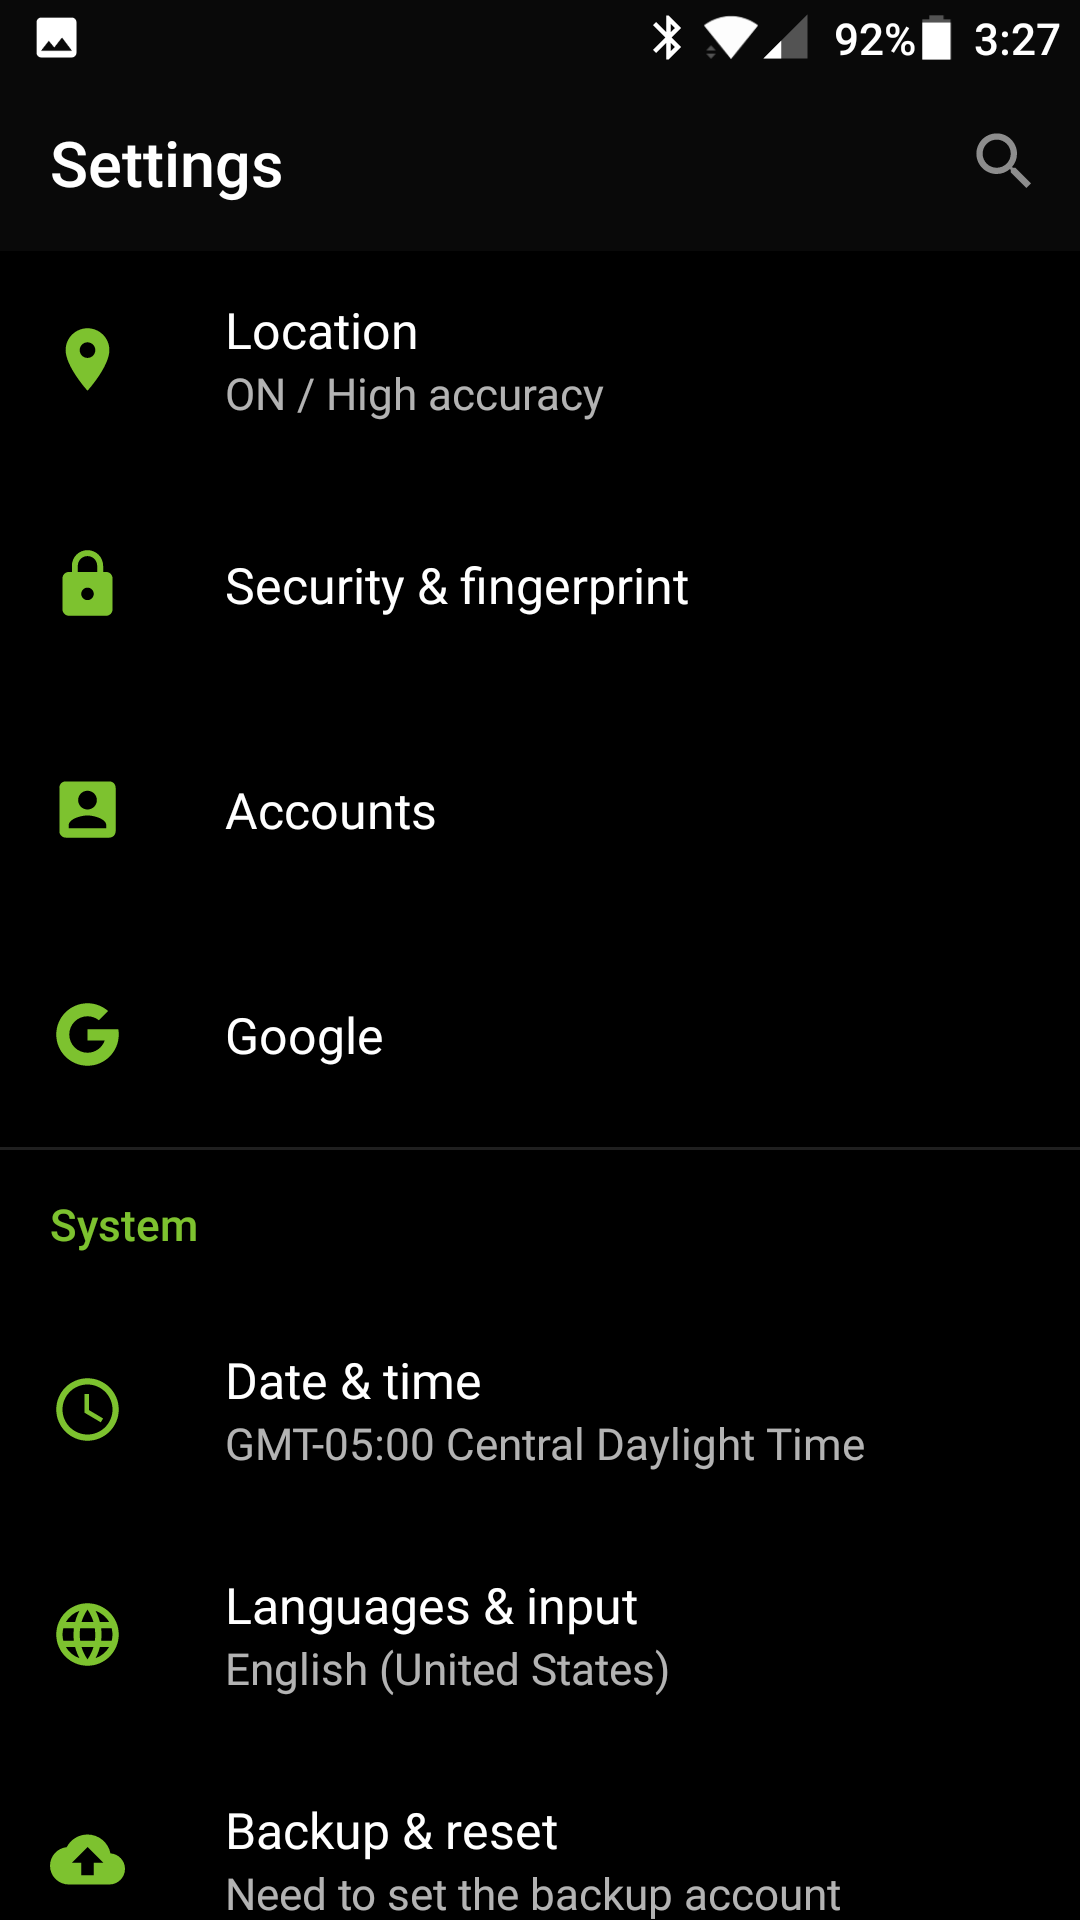 OnePlus email setup